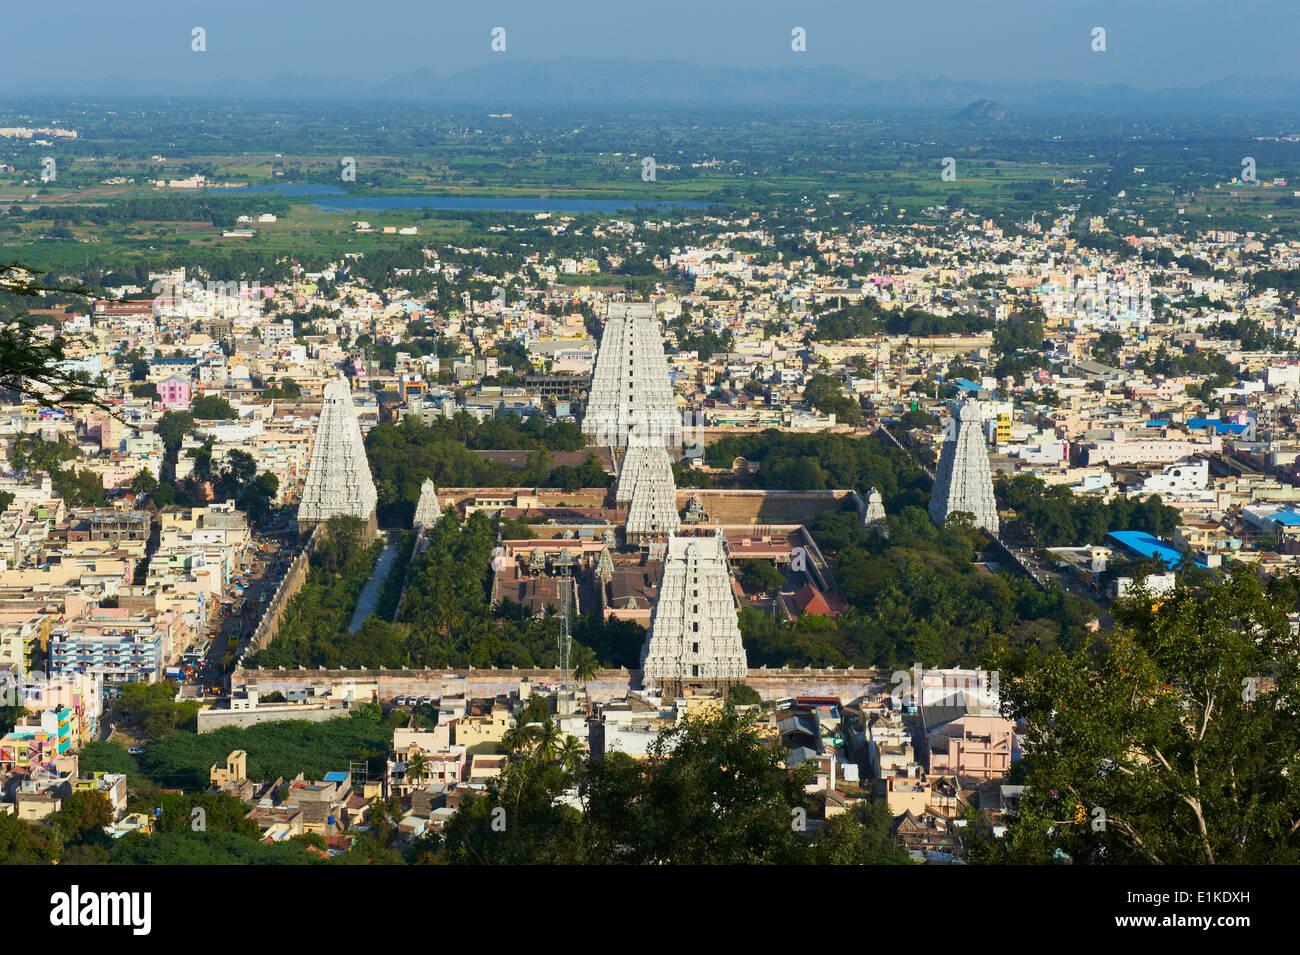 India, Tamil Nadu, Tiruvannamalai, Arunachaleswar temple - Stock Image